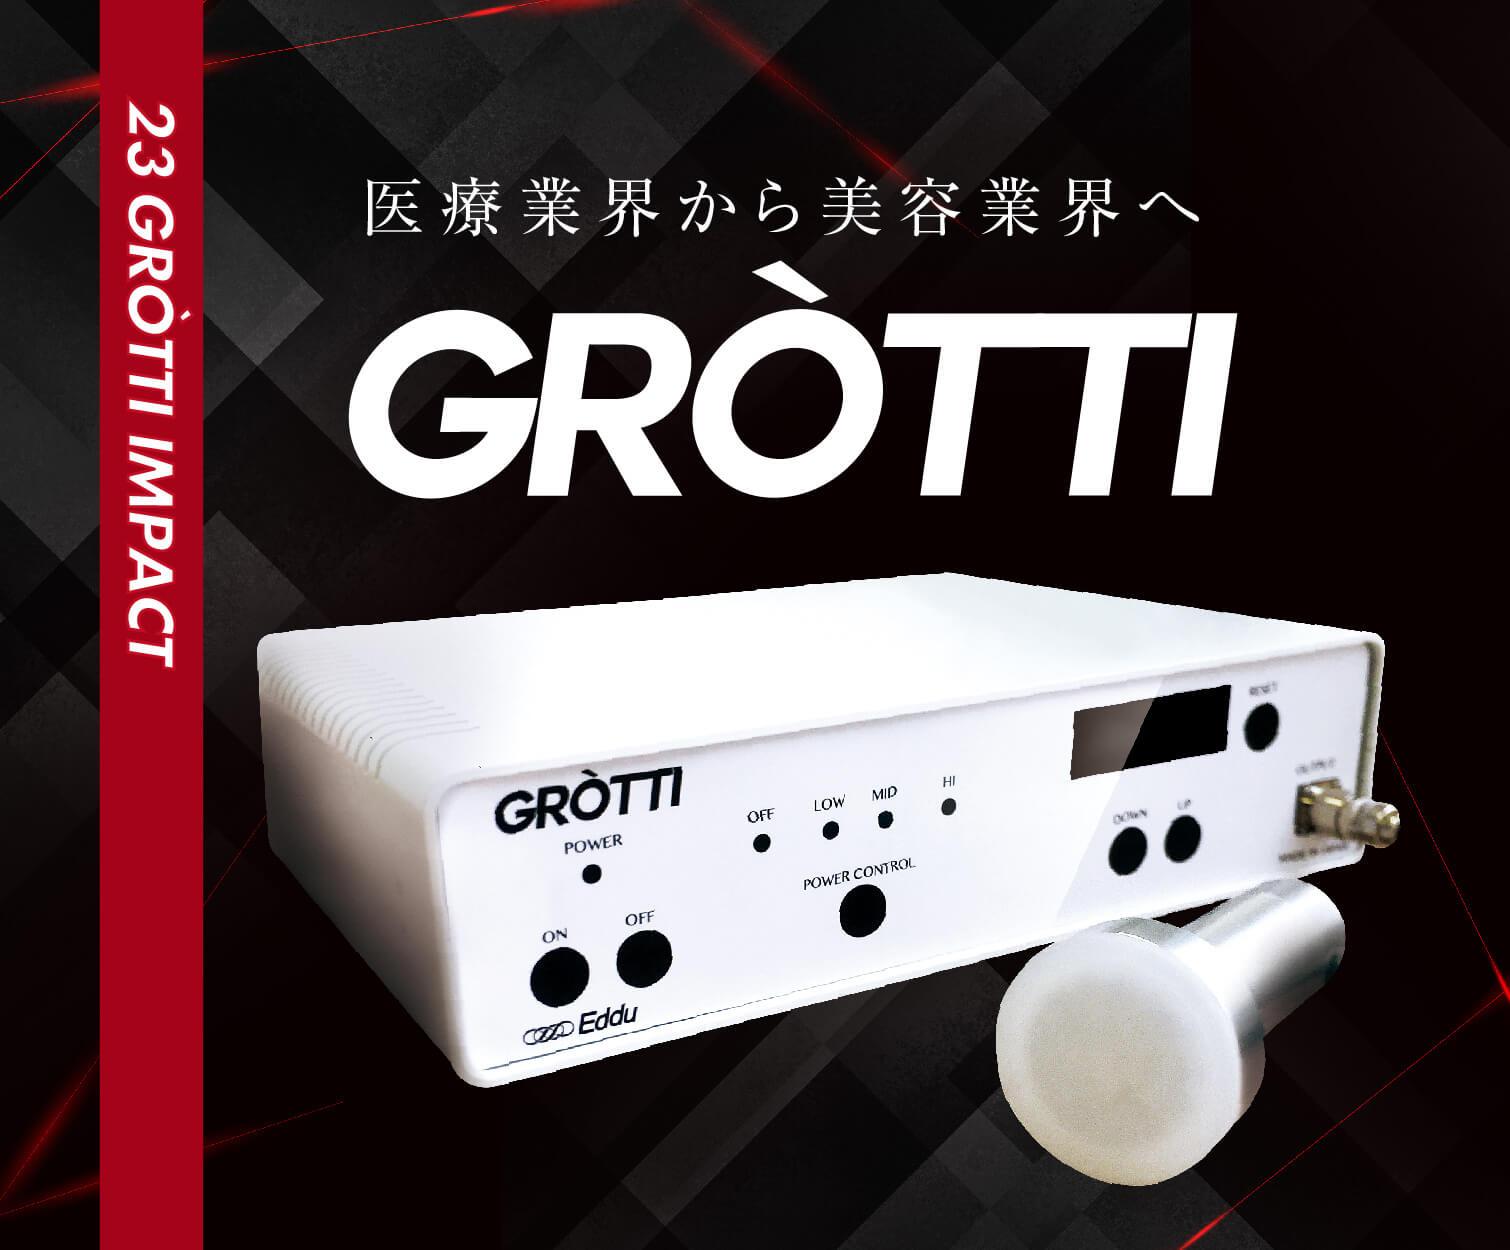 GRÒTTI